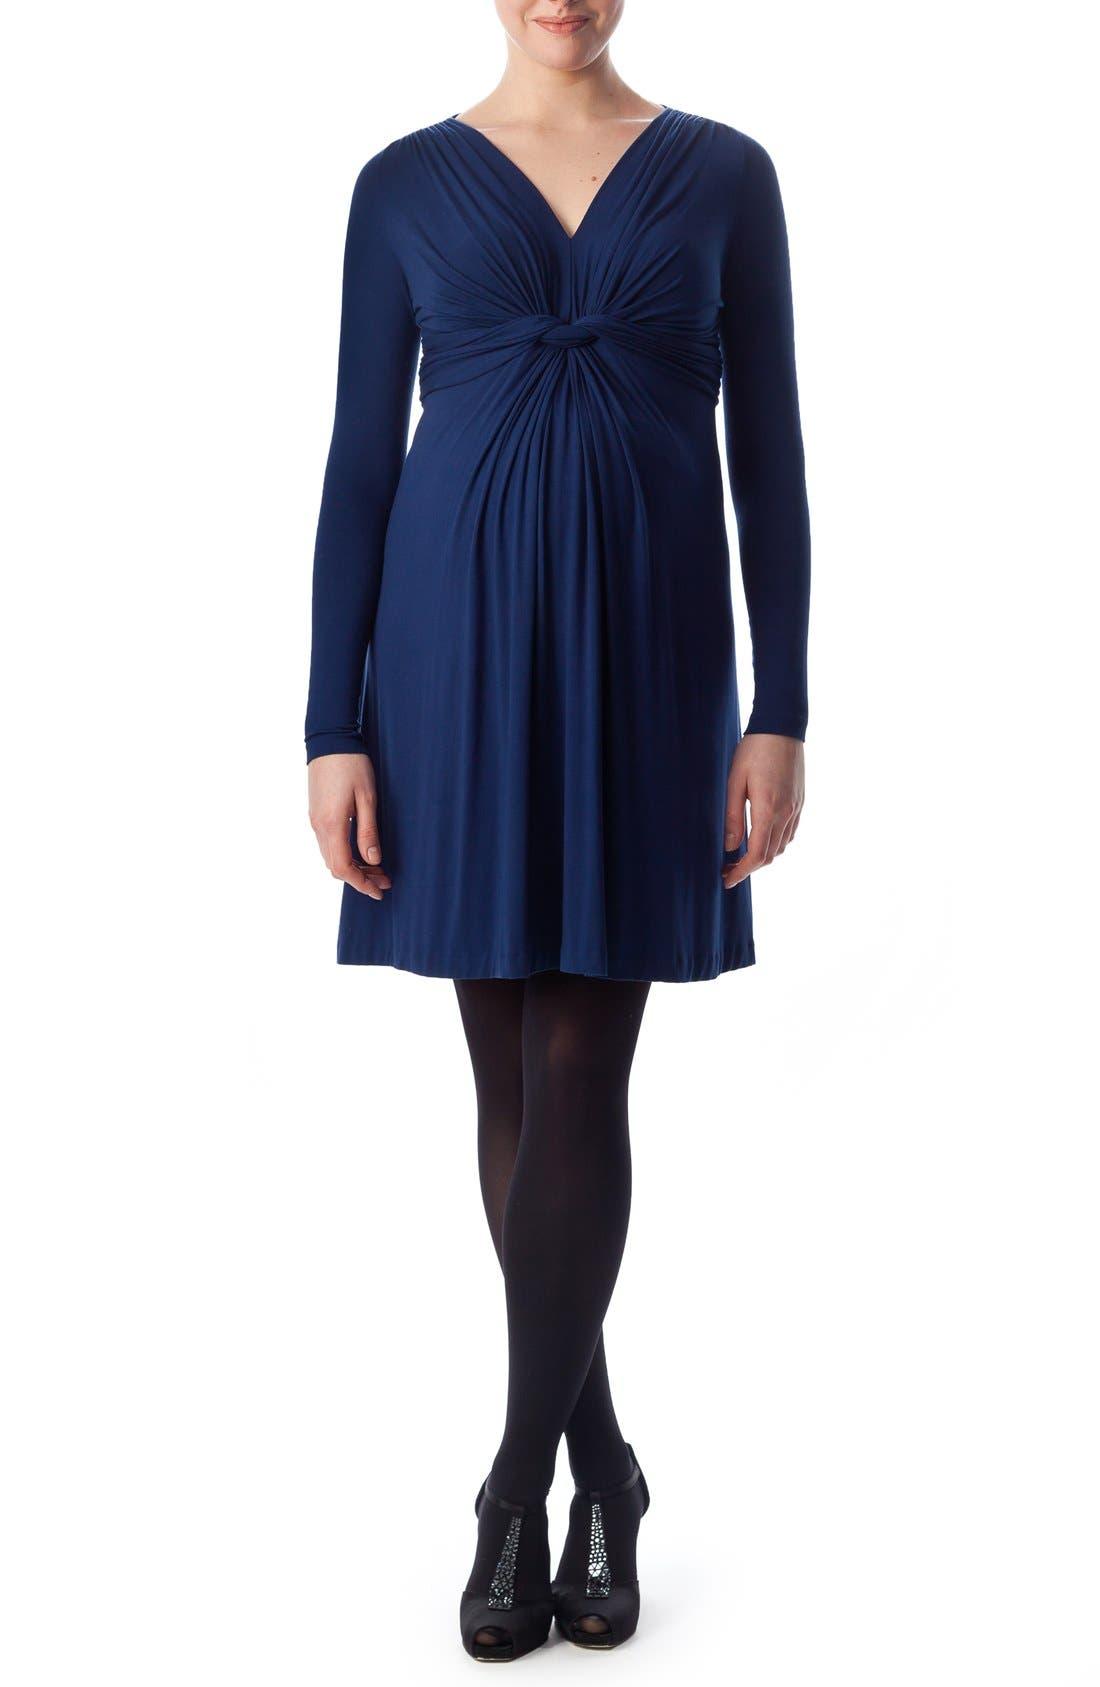 'Madonna' Draped Maternity Dress,                         Main,                         color, Moonlight Blue